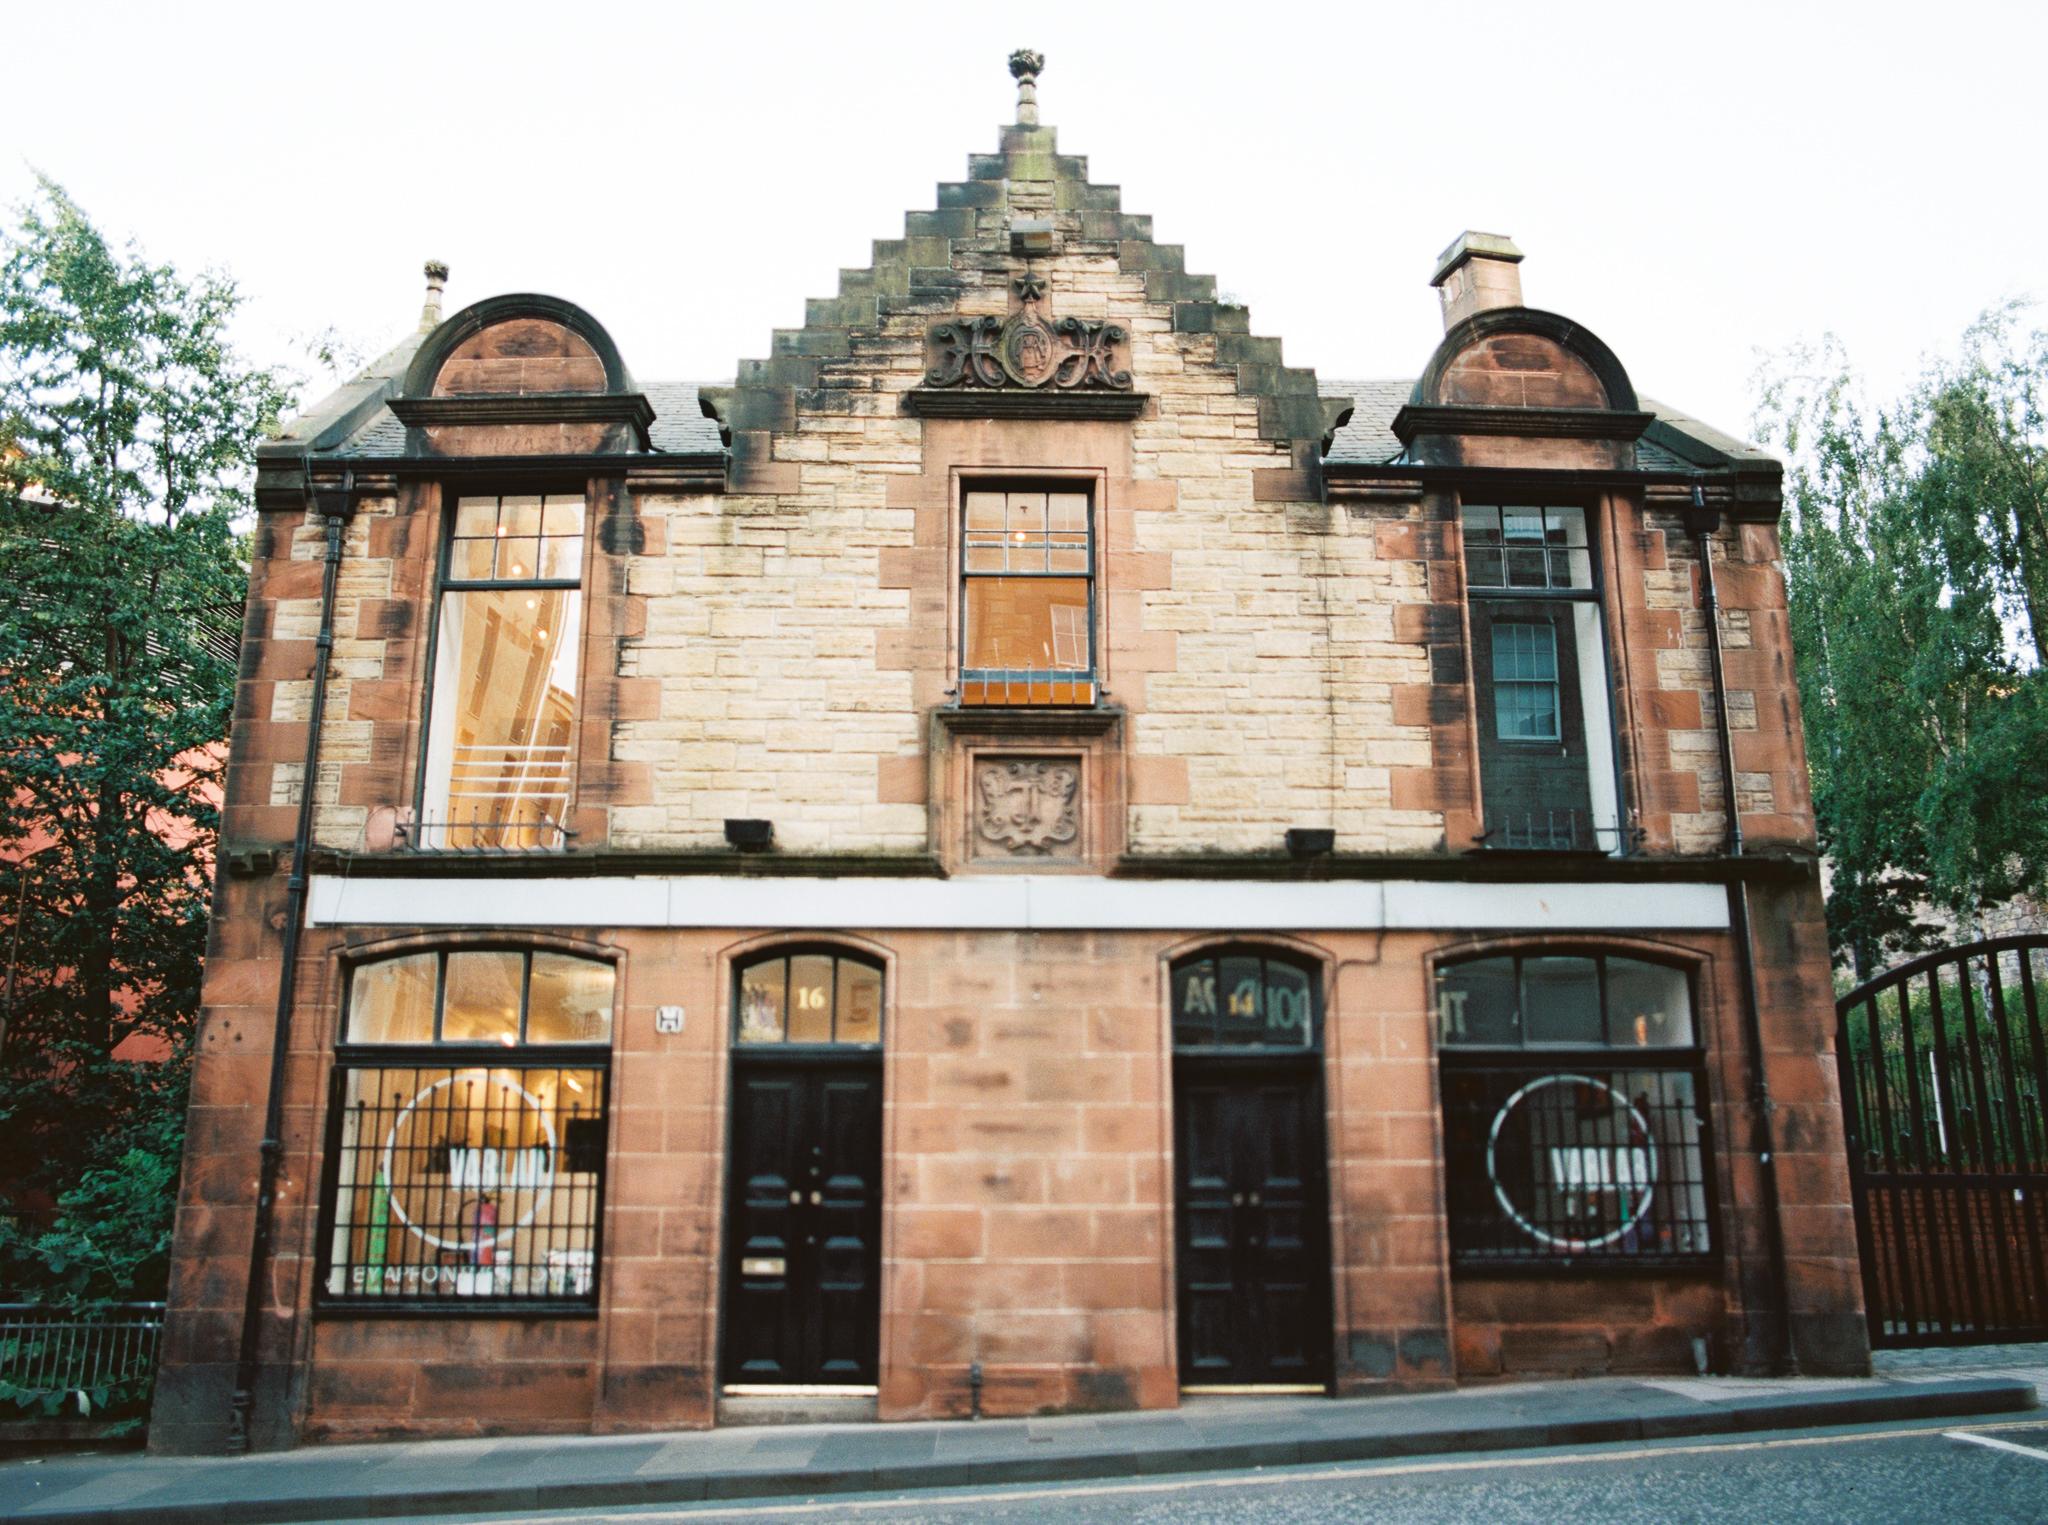 Scotland_Glasgow+Edinburgh_Day2-12.jpg